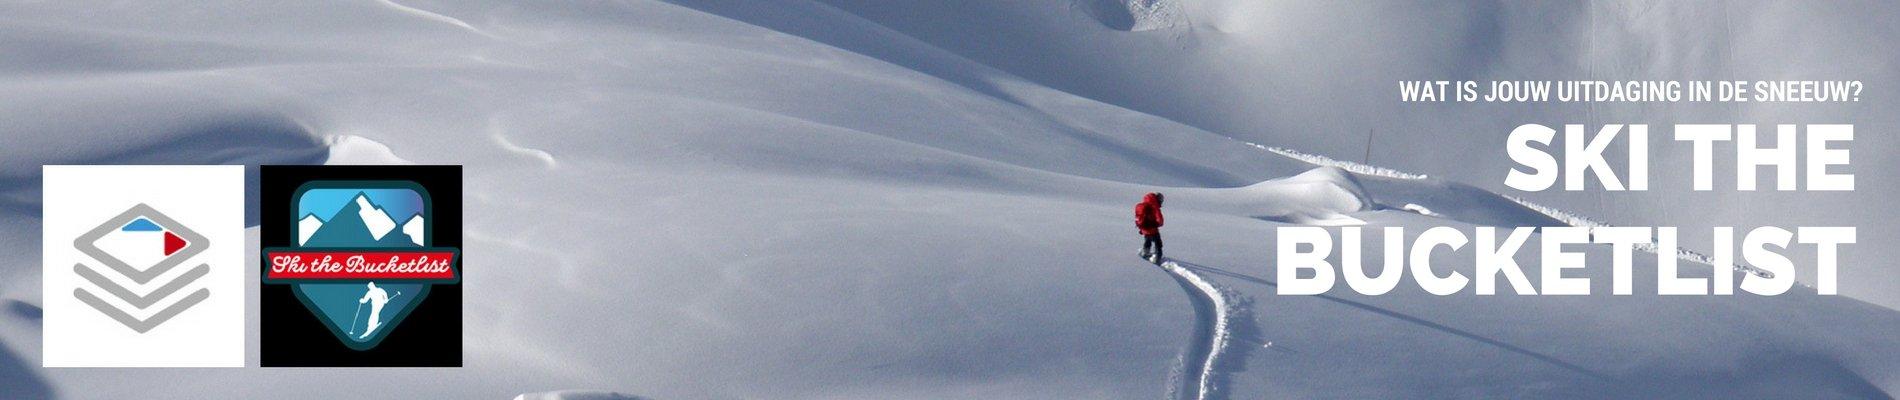 ski the bucketlist